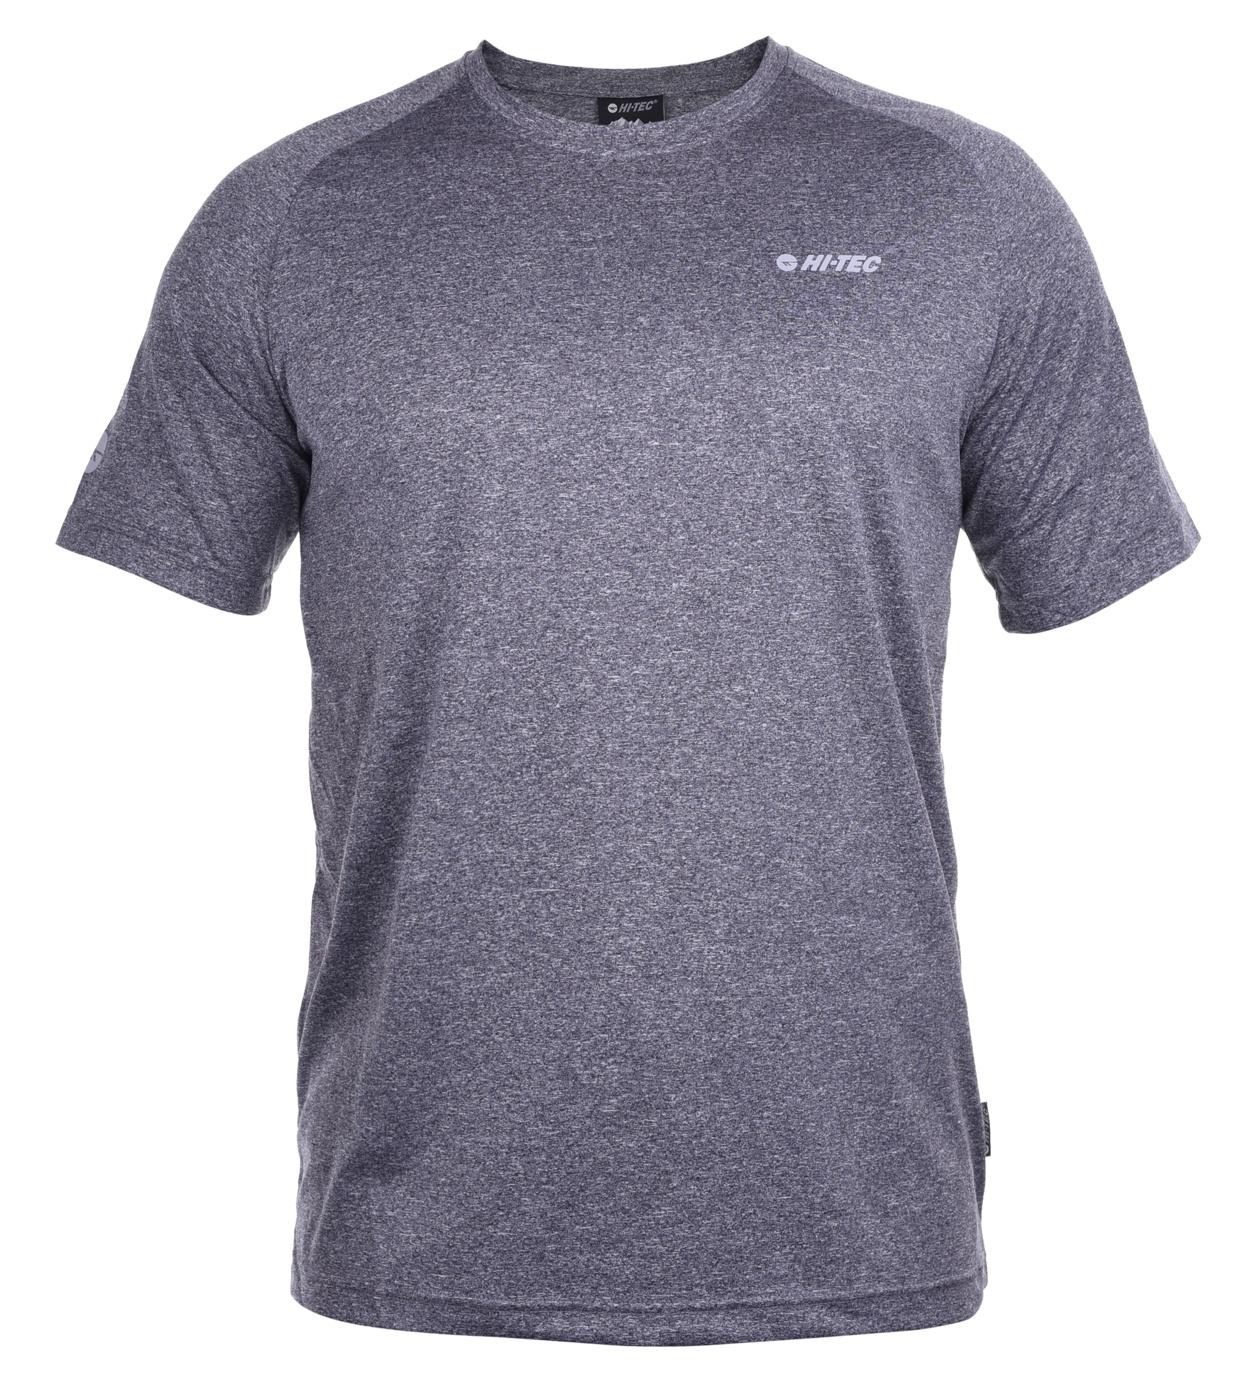 Koszulka szybkoschnąca ROTO HI-TEC za 29,99zł @ Martes